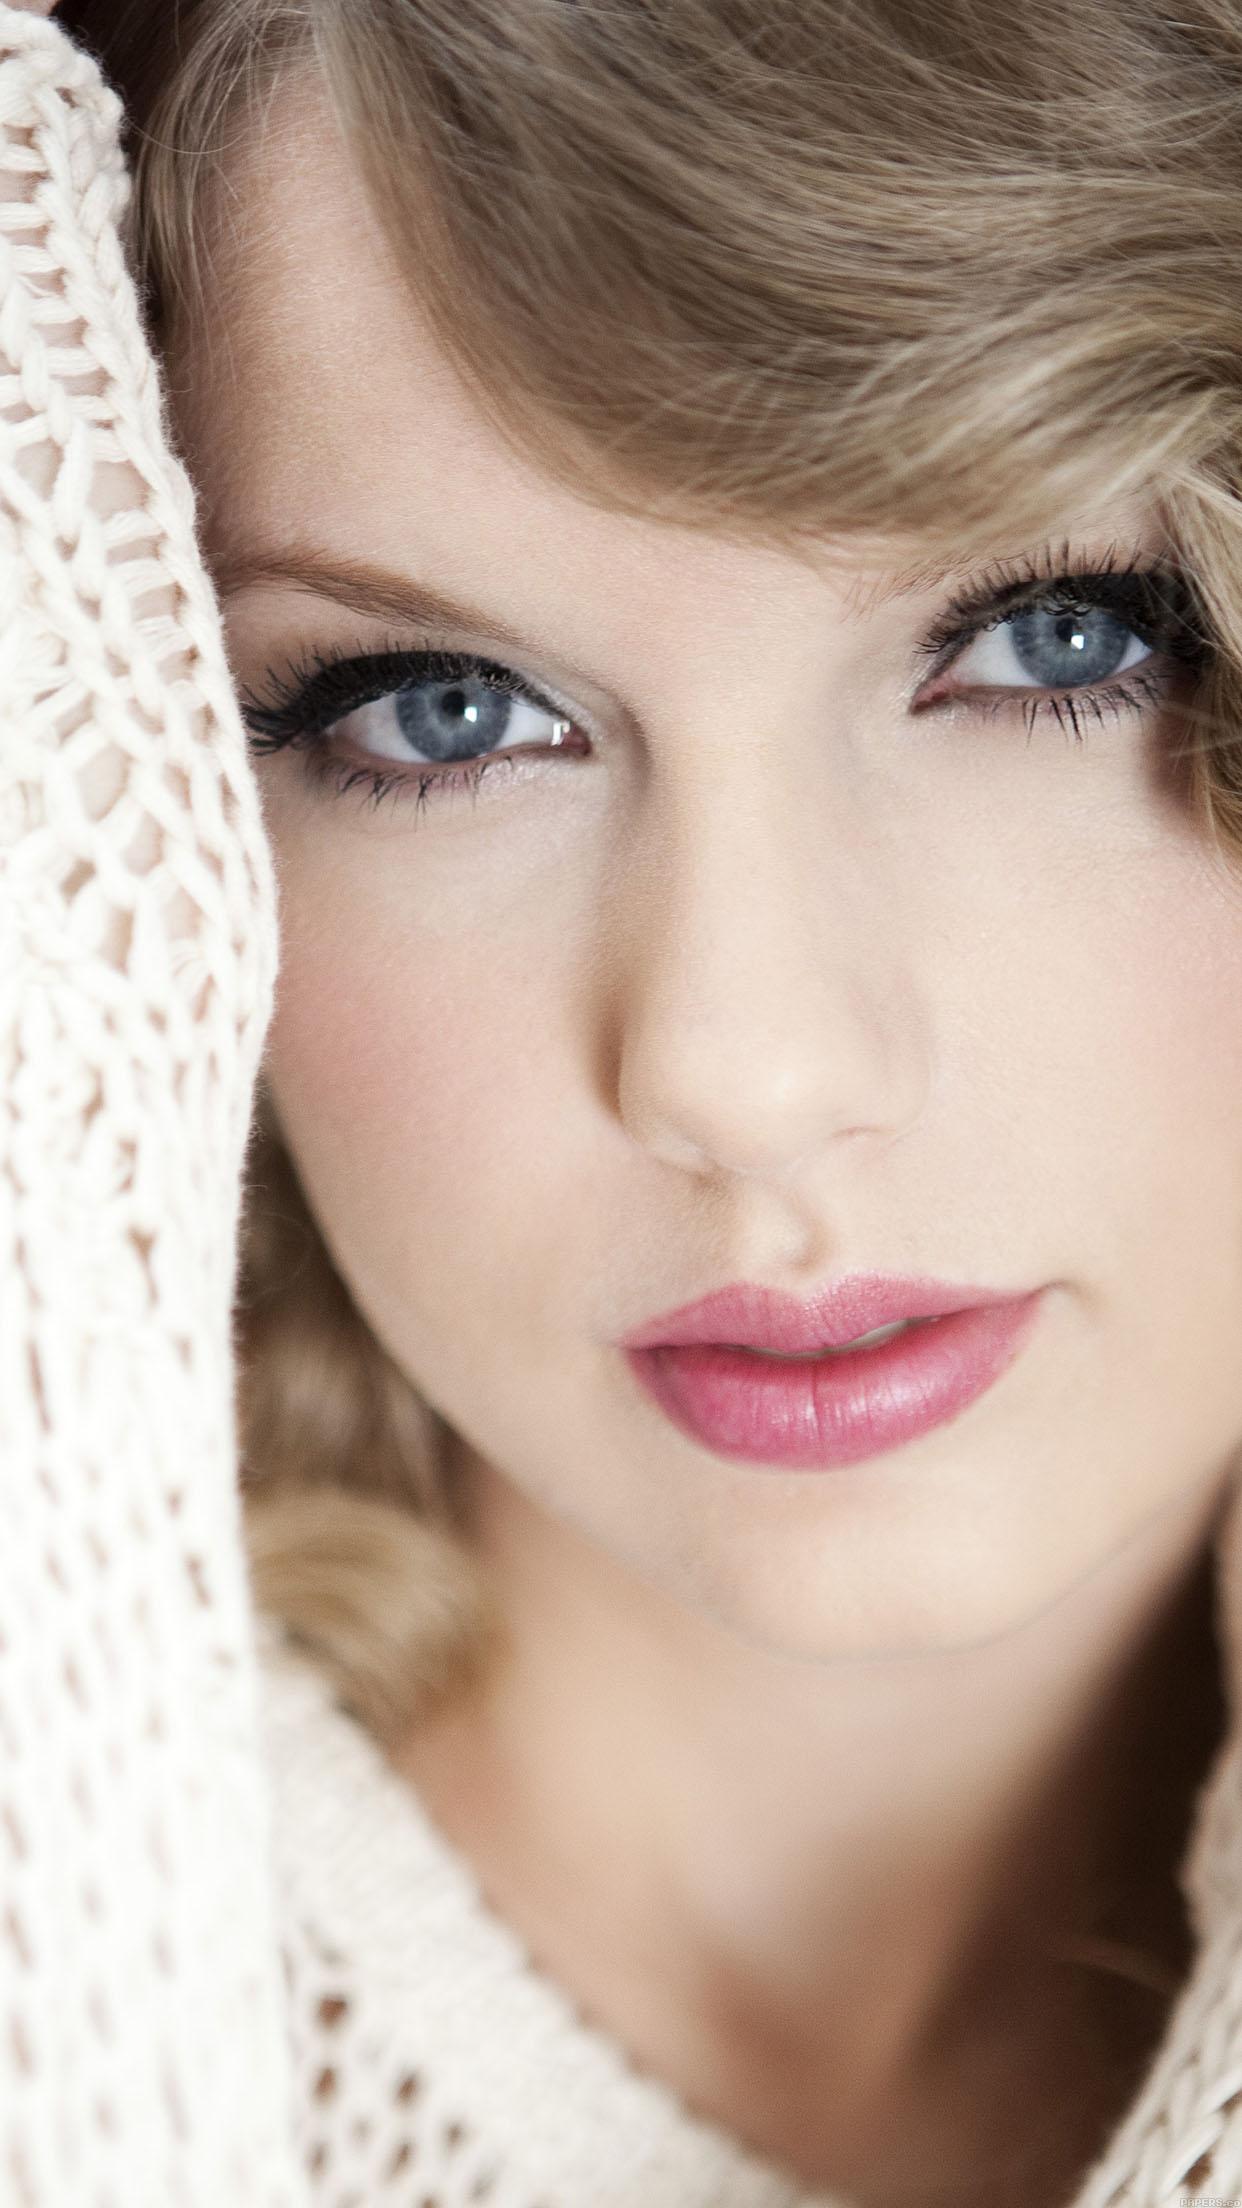 Iphone 7 Plus - Taylor Swift Speak Now Photoshoot , HD Wallpaper & Backgrounds